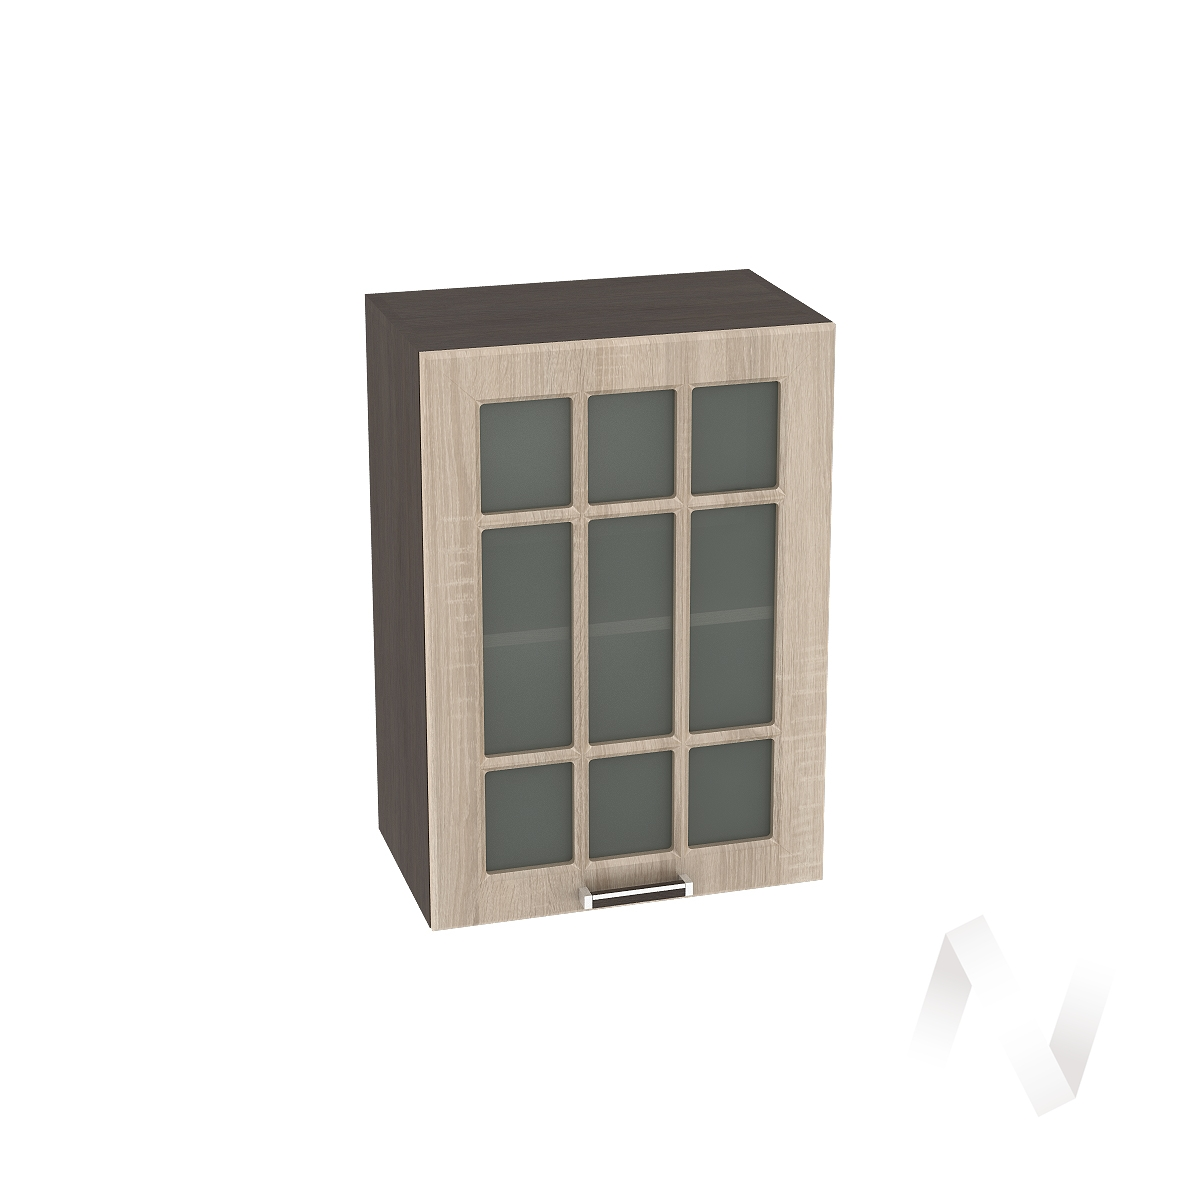 "Кухня ""Прага"": Шкаф верхний со стеклом 500, ШВС 500 (дуб сонома/корпус венге)"